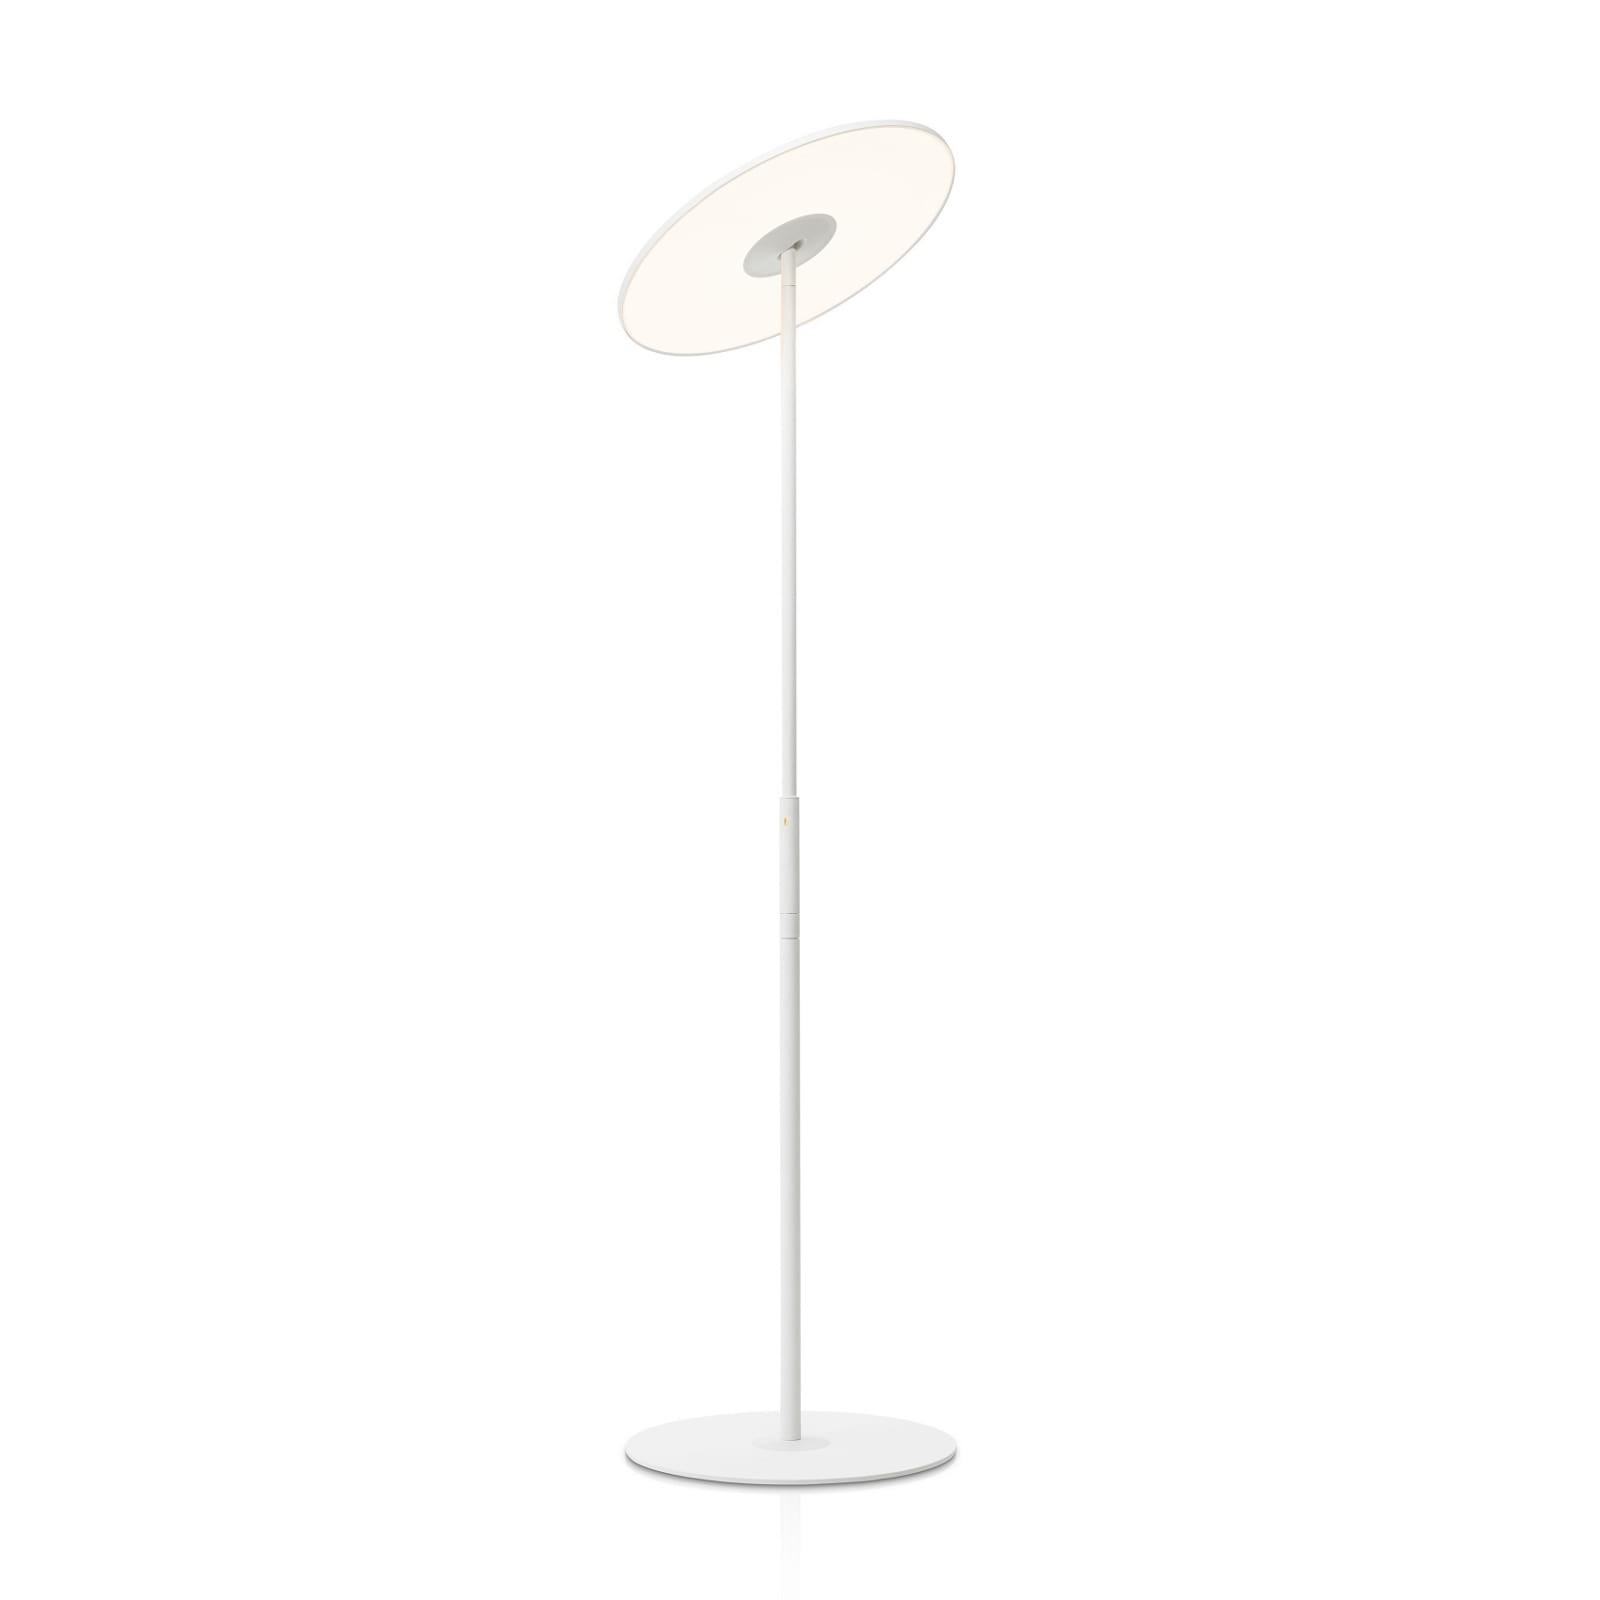 Circa Flat Panel LED Floor Lamp (White) - Pablo Designs